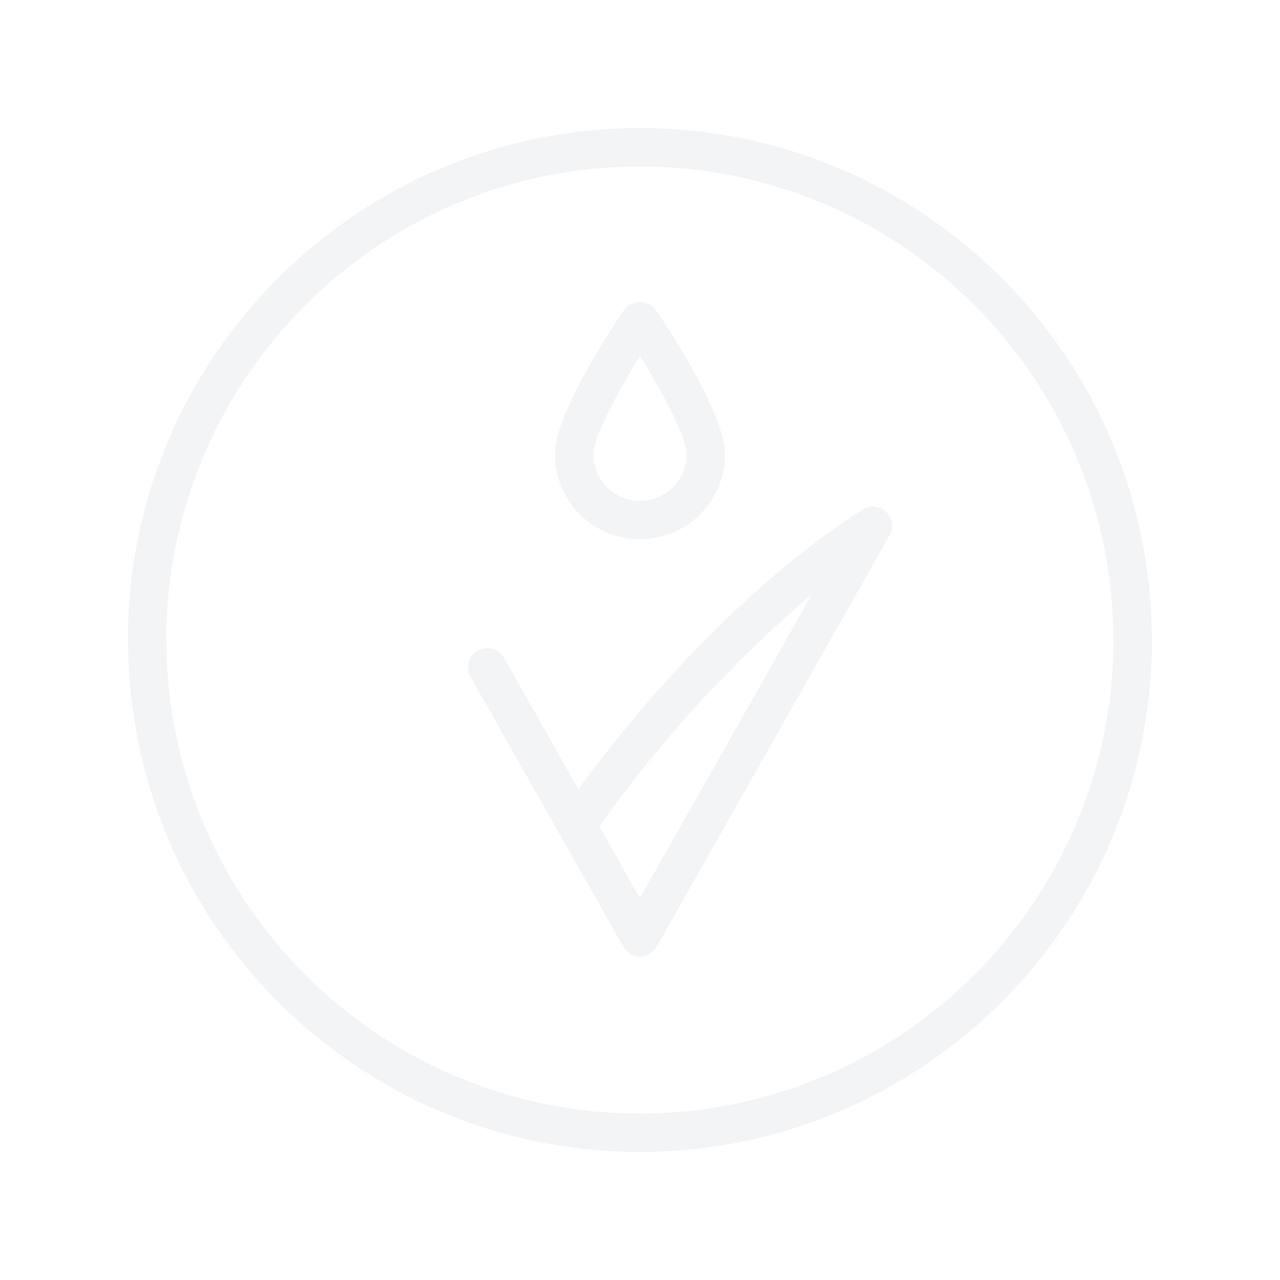 LANCOME Renergie Yeux Multi-Lift Eye Cream 15ml